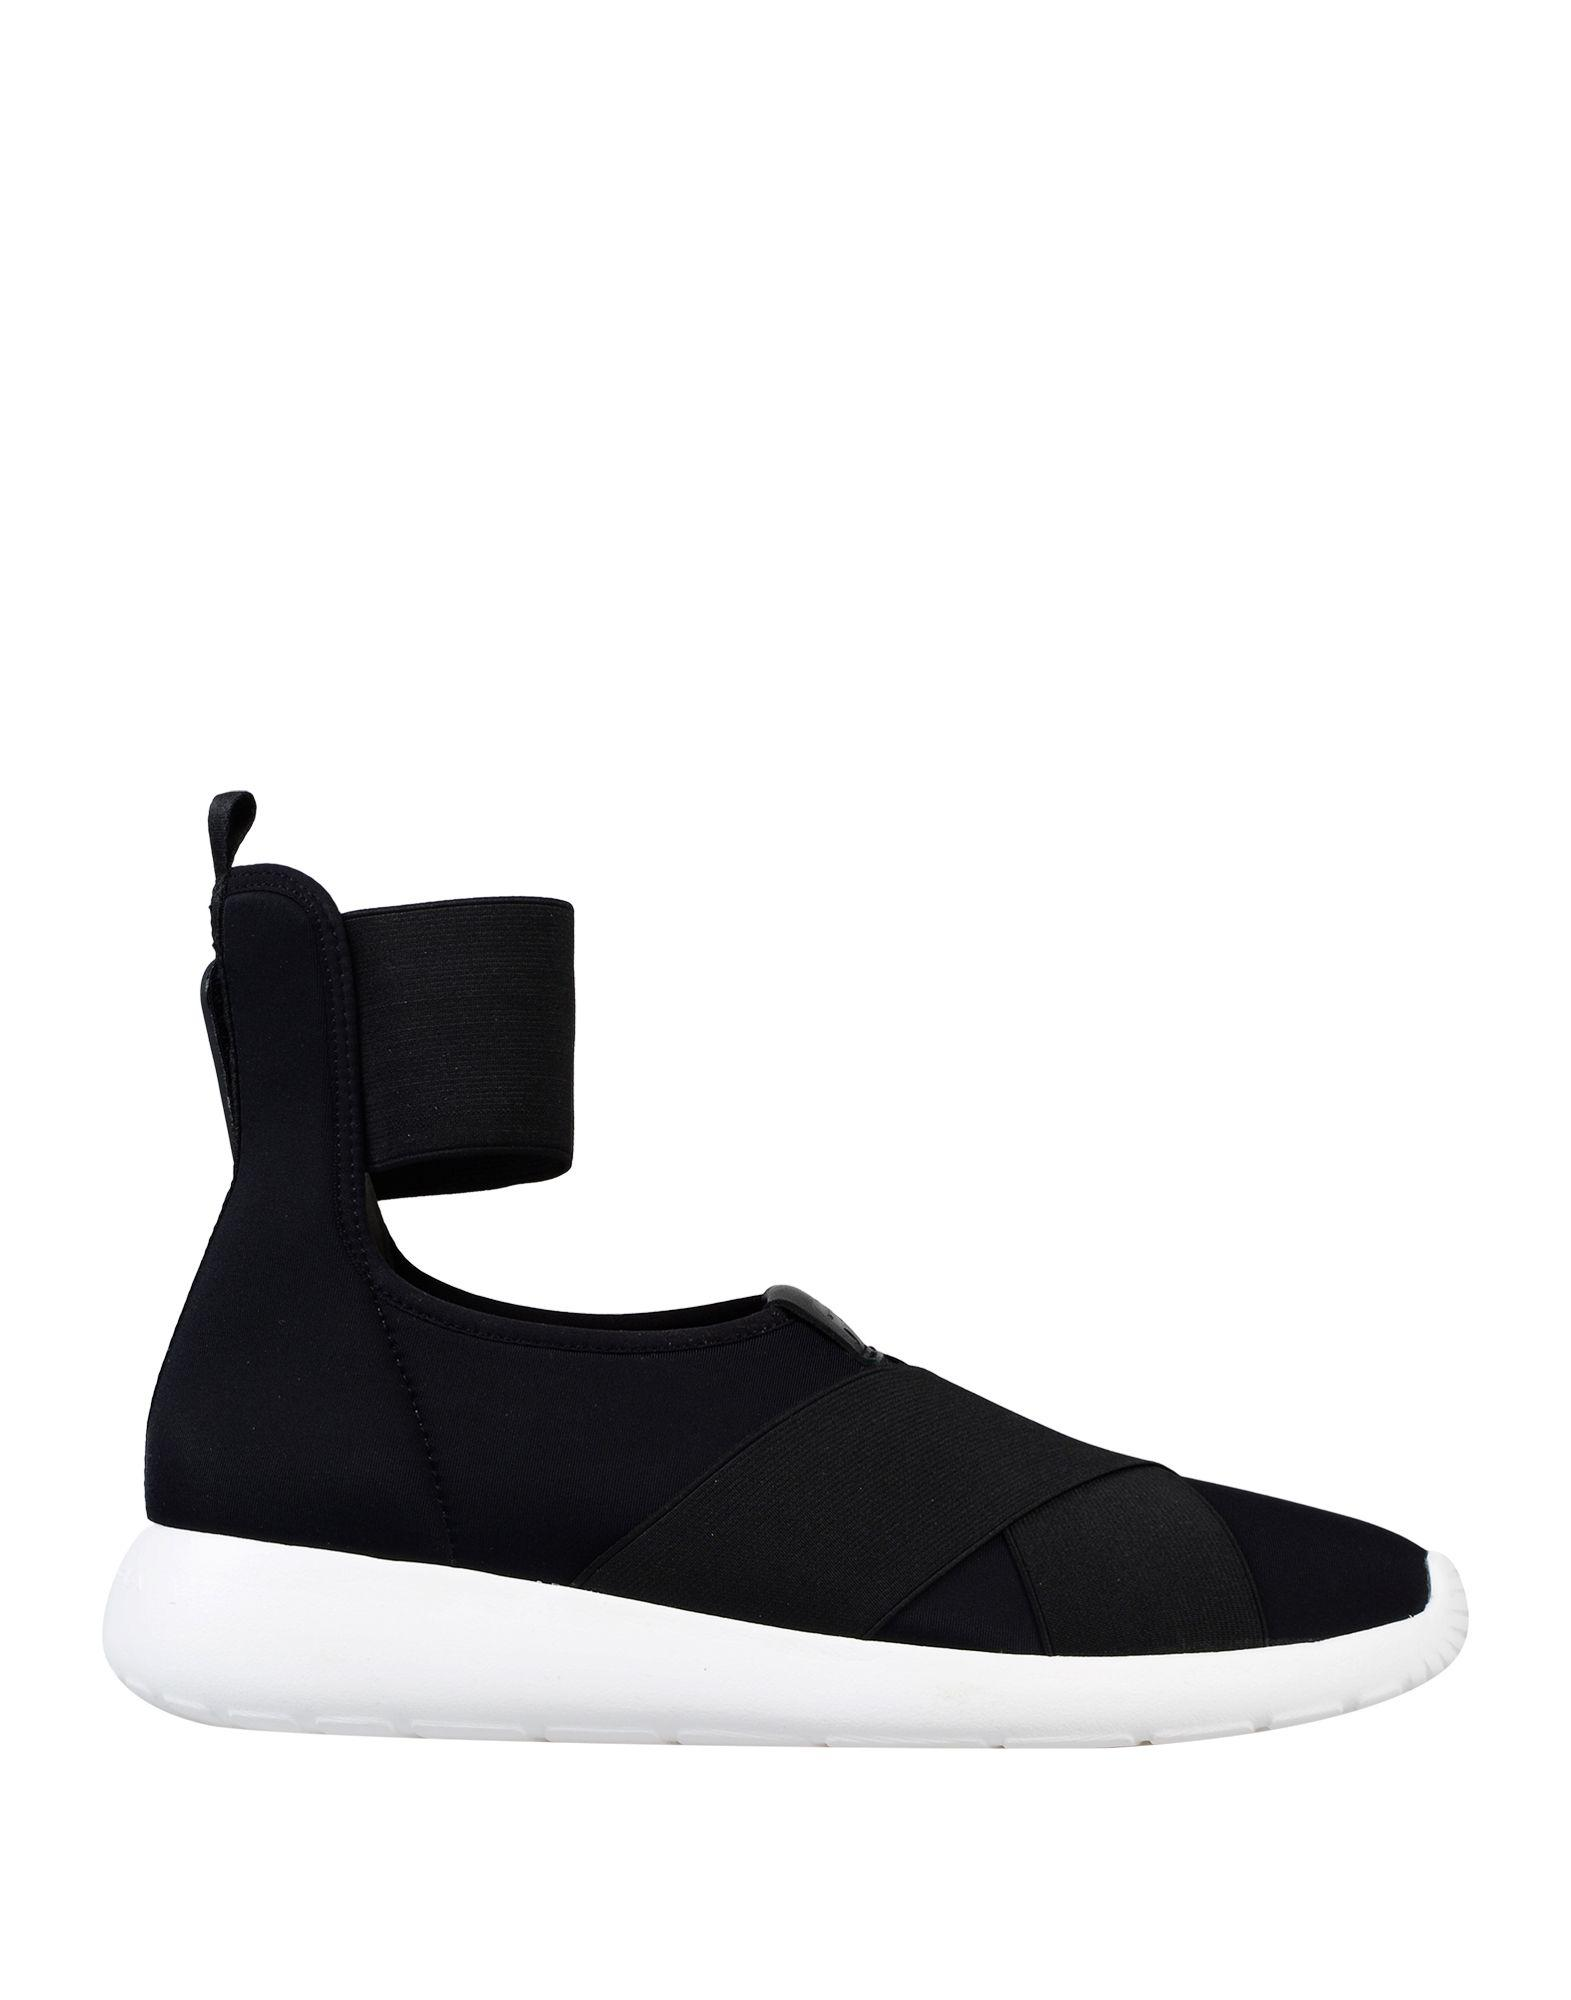 on sale 8e20e 292a2 fessura-Black-High-tops-Sneakers.jpeg